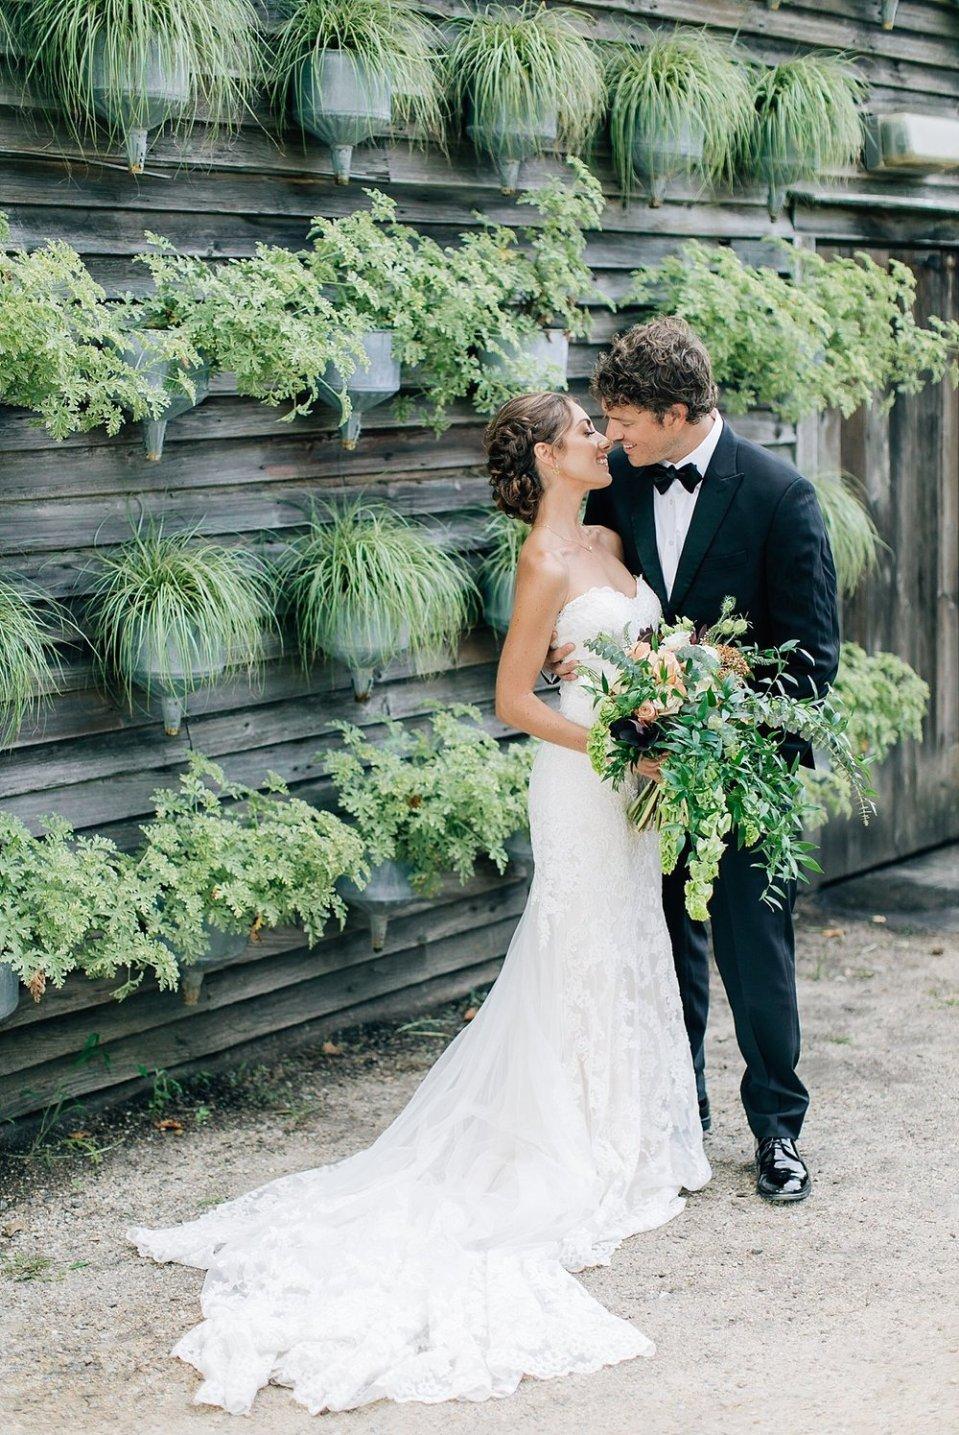 terrain gatherings glen mills pa romantic garden wedding photography magdalena studios 0022